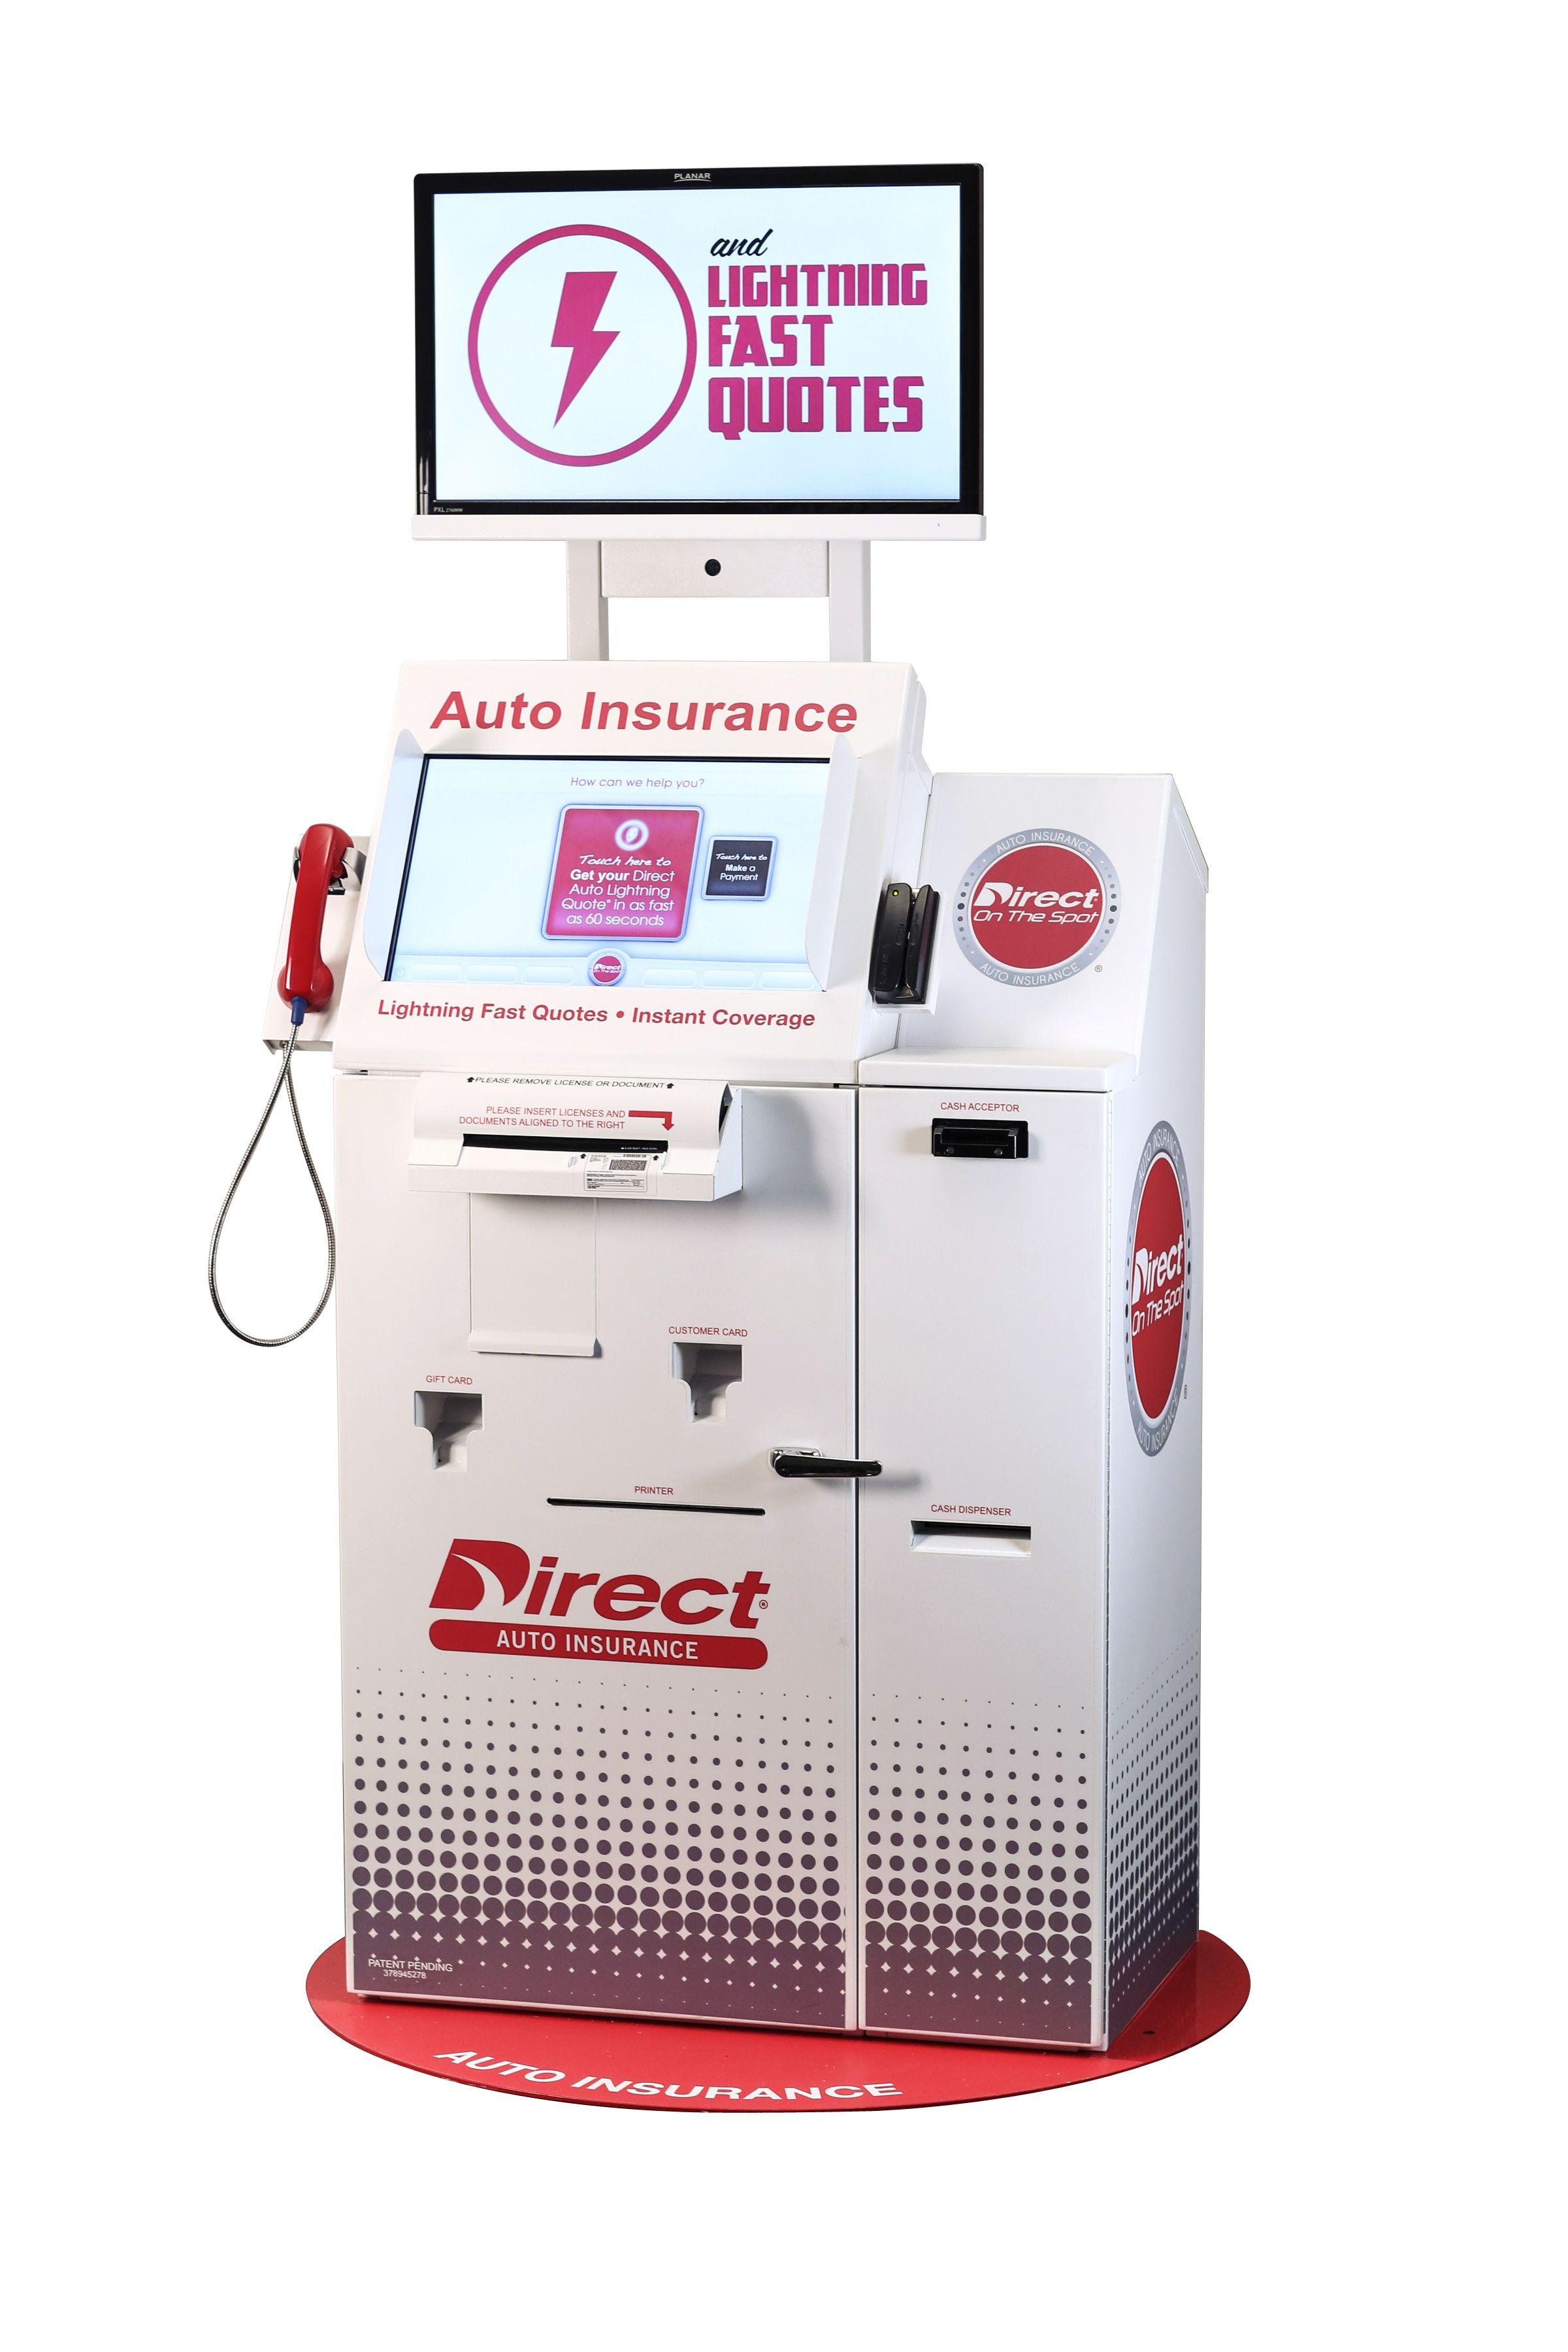 Insurance Kiosk Directauto Dots Clean Ashx 2400 3600 Car Insurance Insurance Auto Insurance Quotes